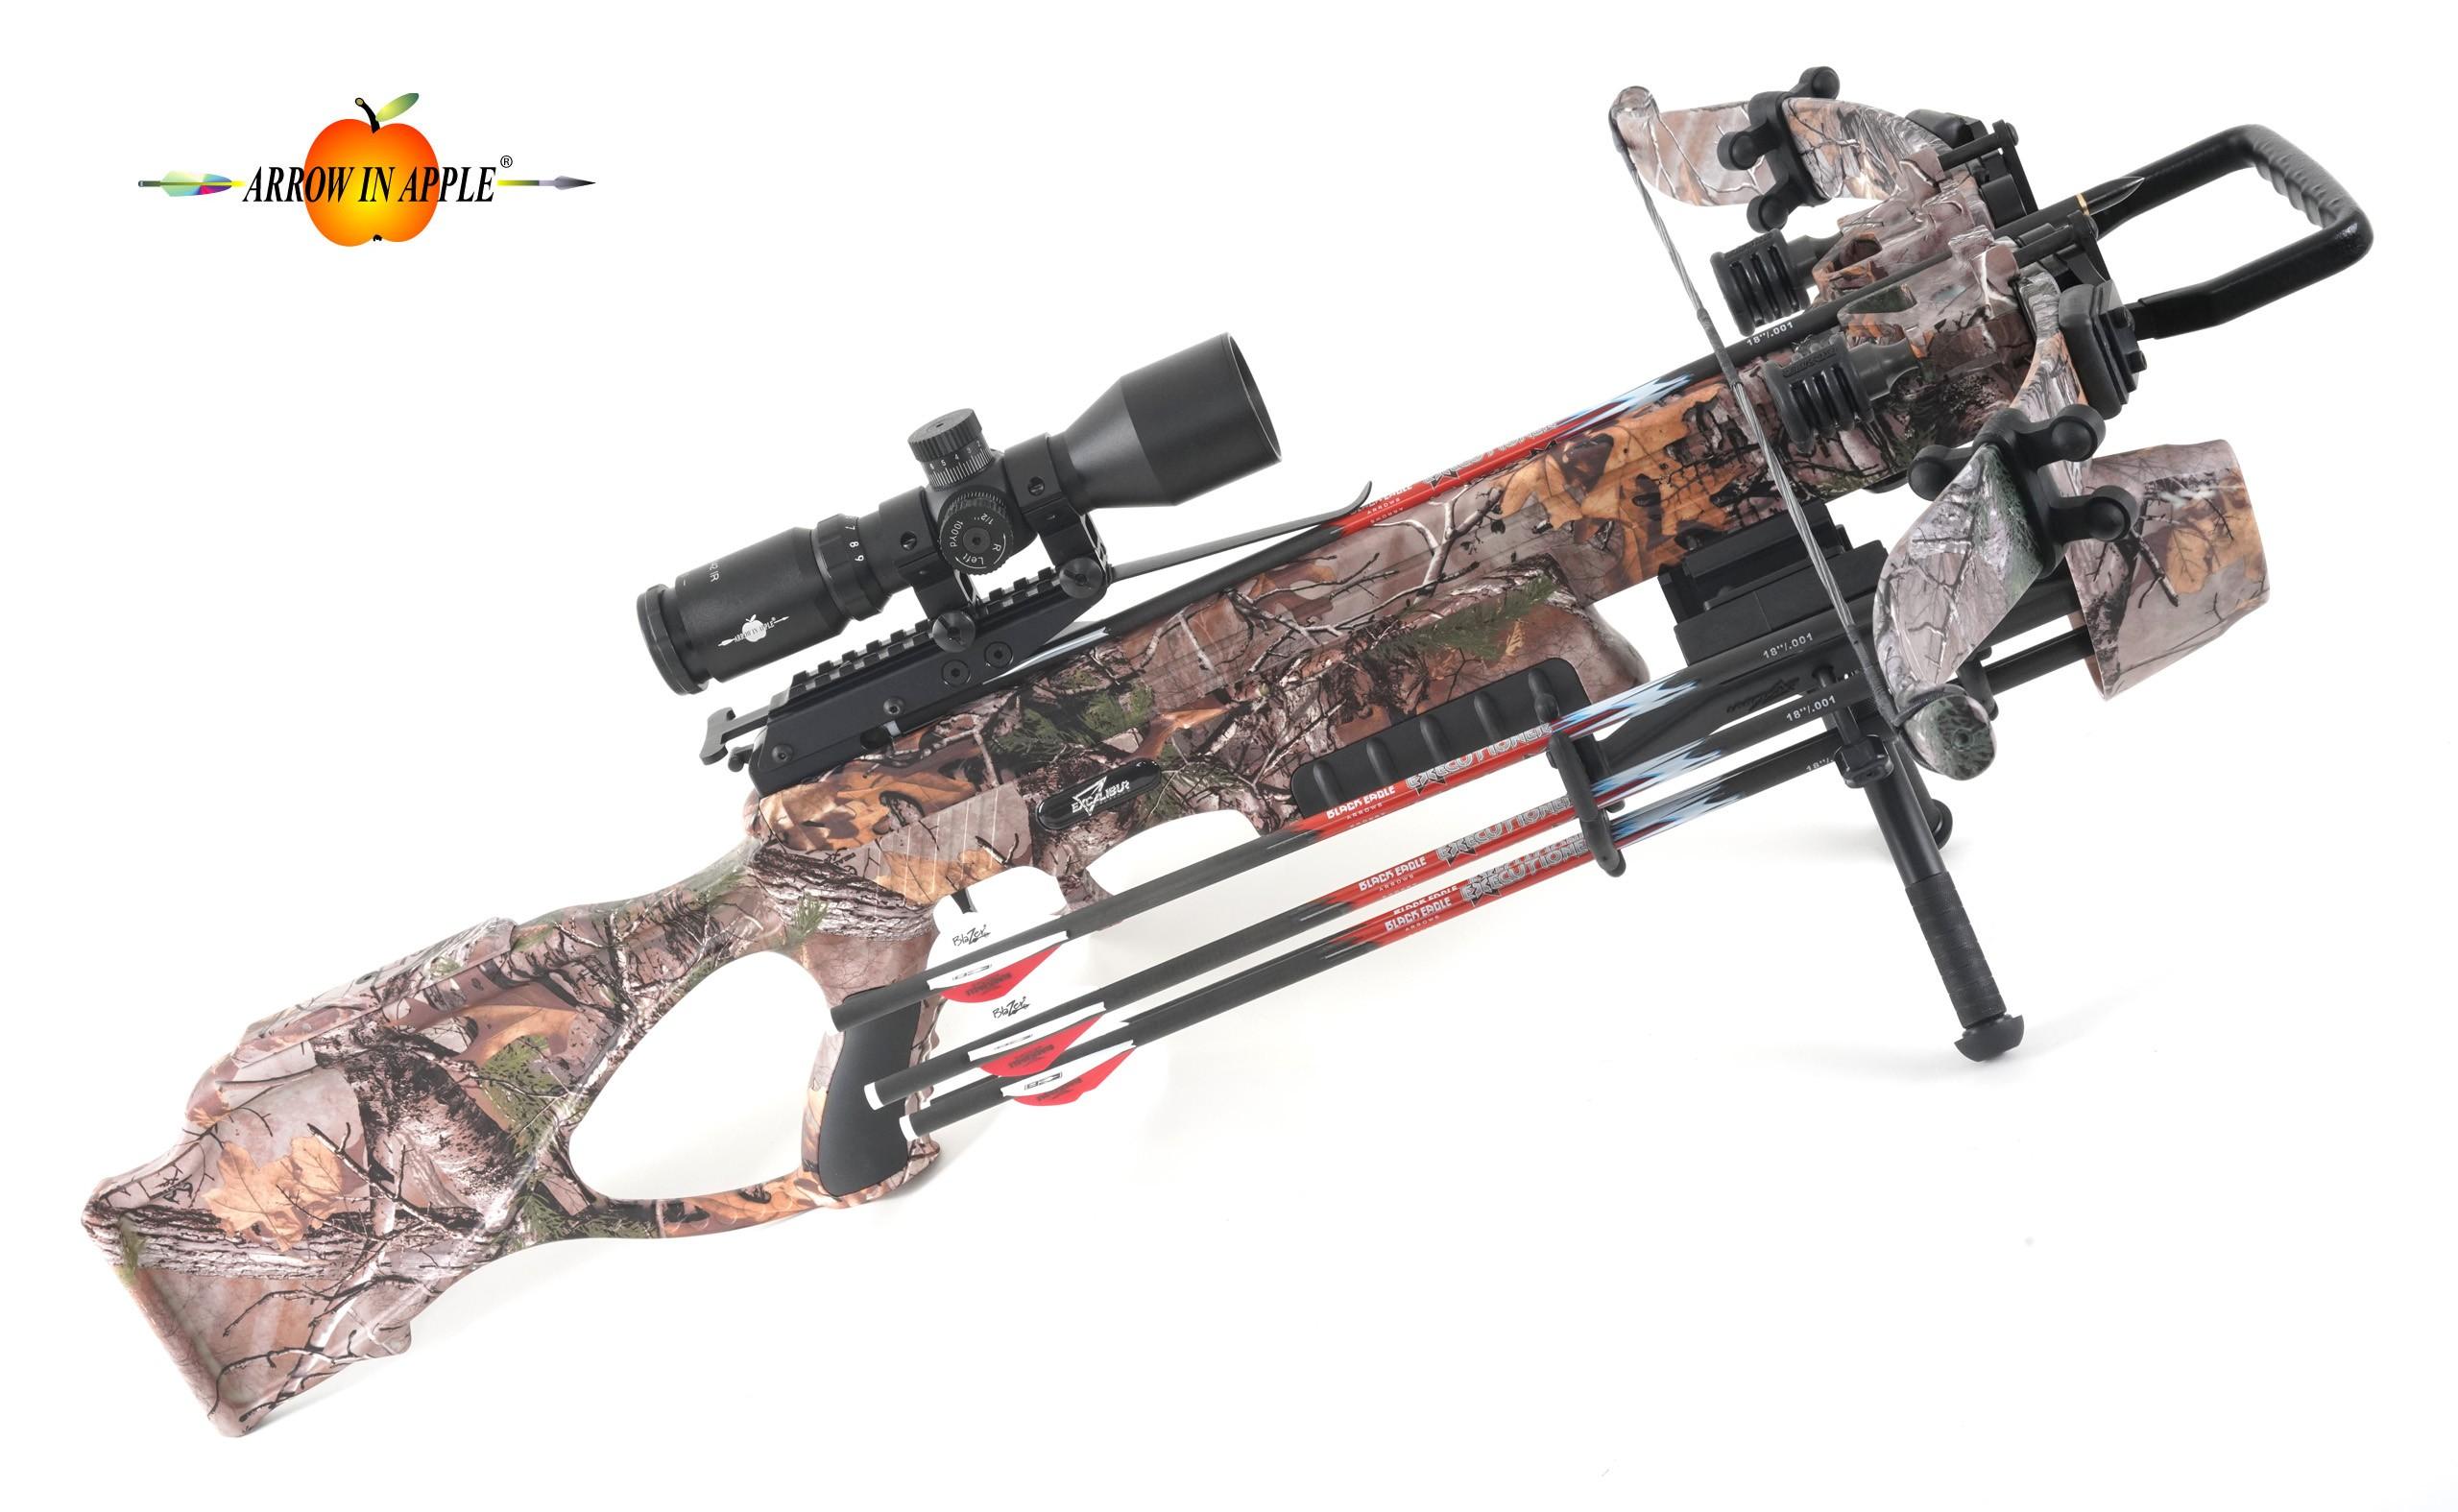 excalibur matrix 380 realtree xtra recurve crossbow. Black Bedroom Furniture Sets. Home Design Ideas